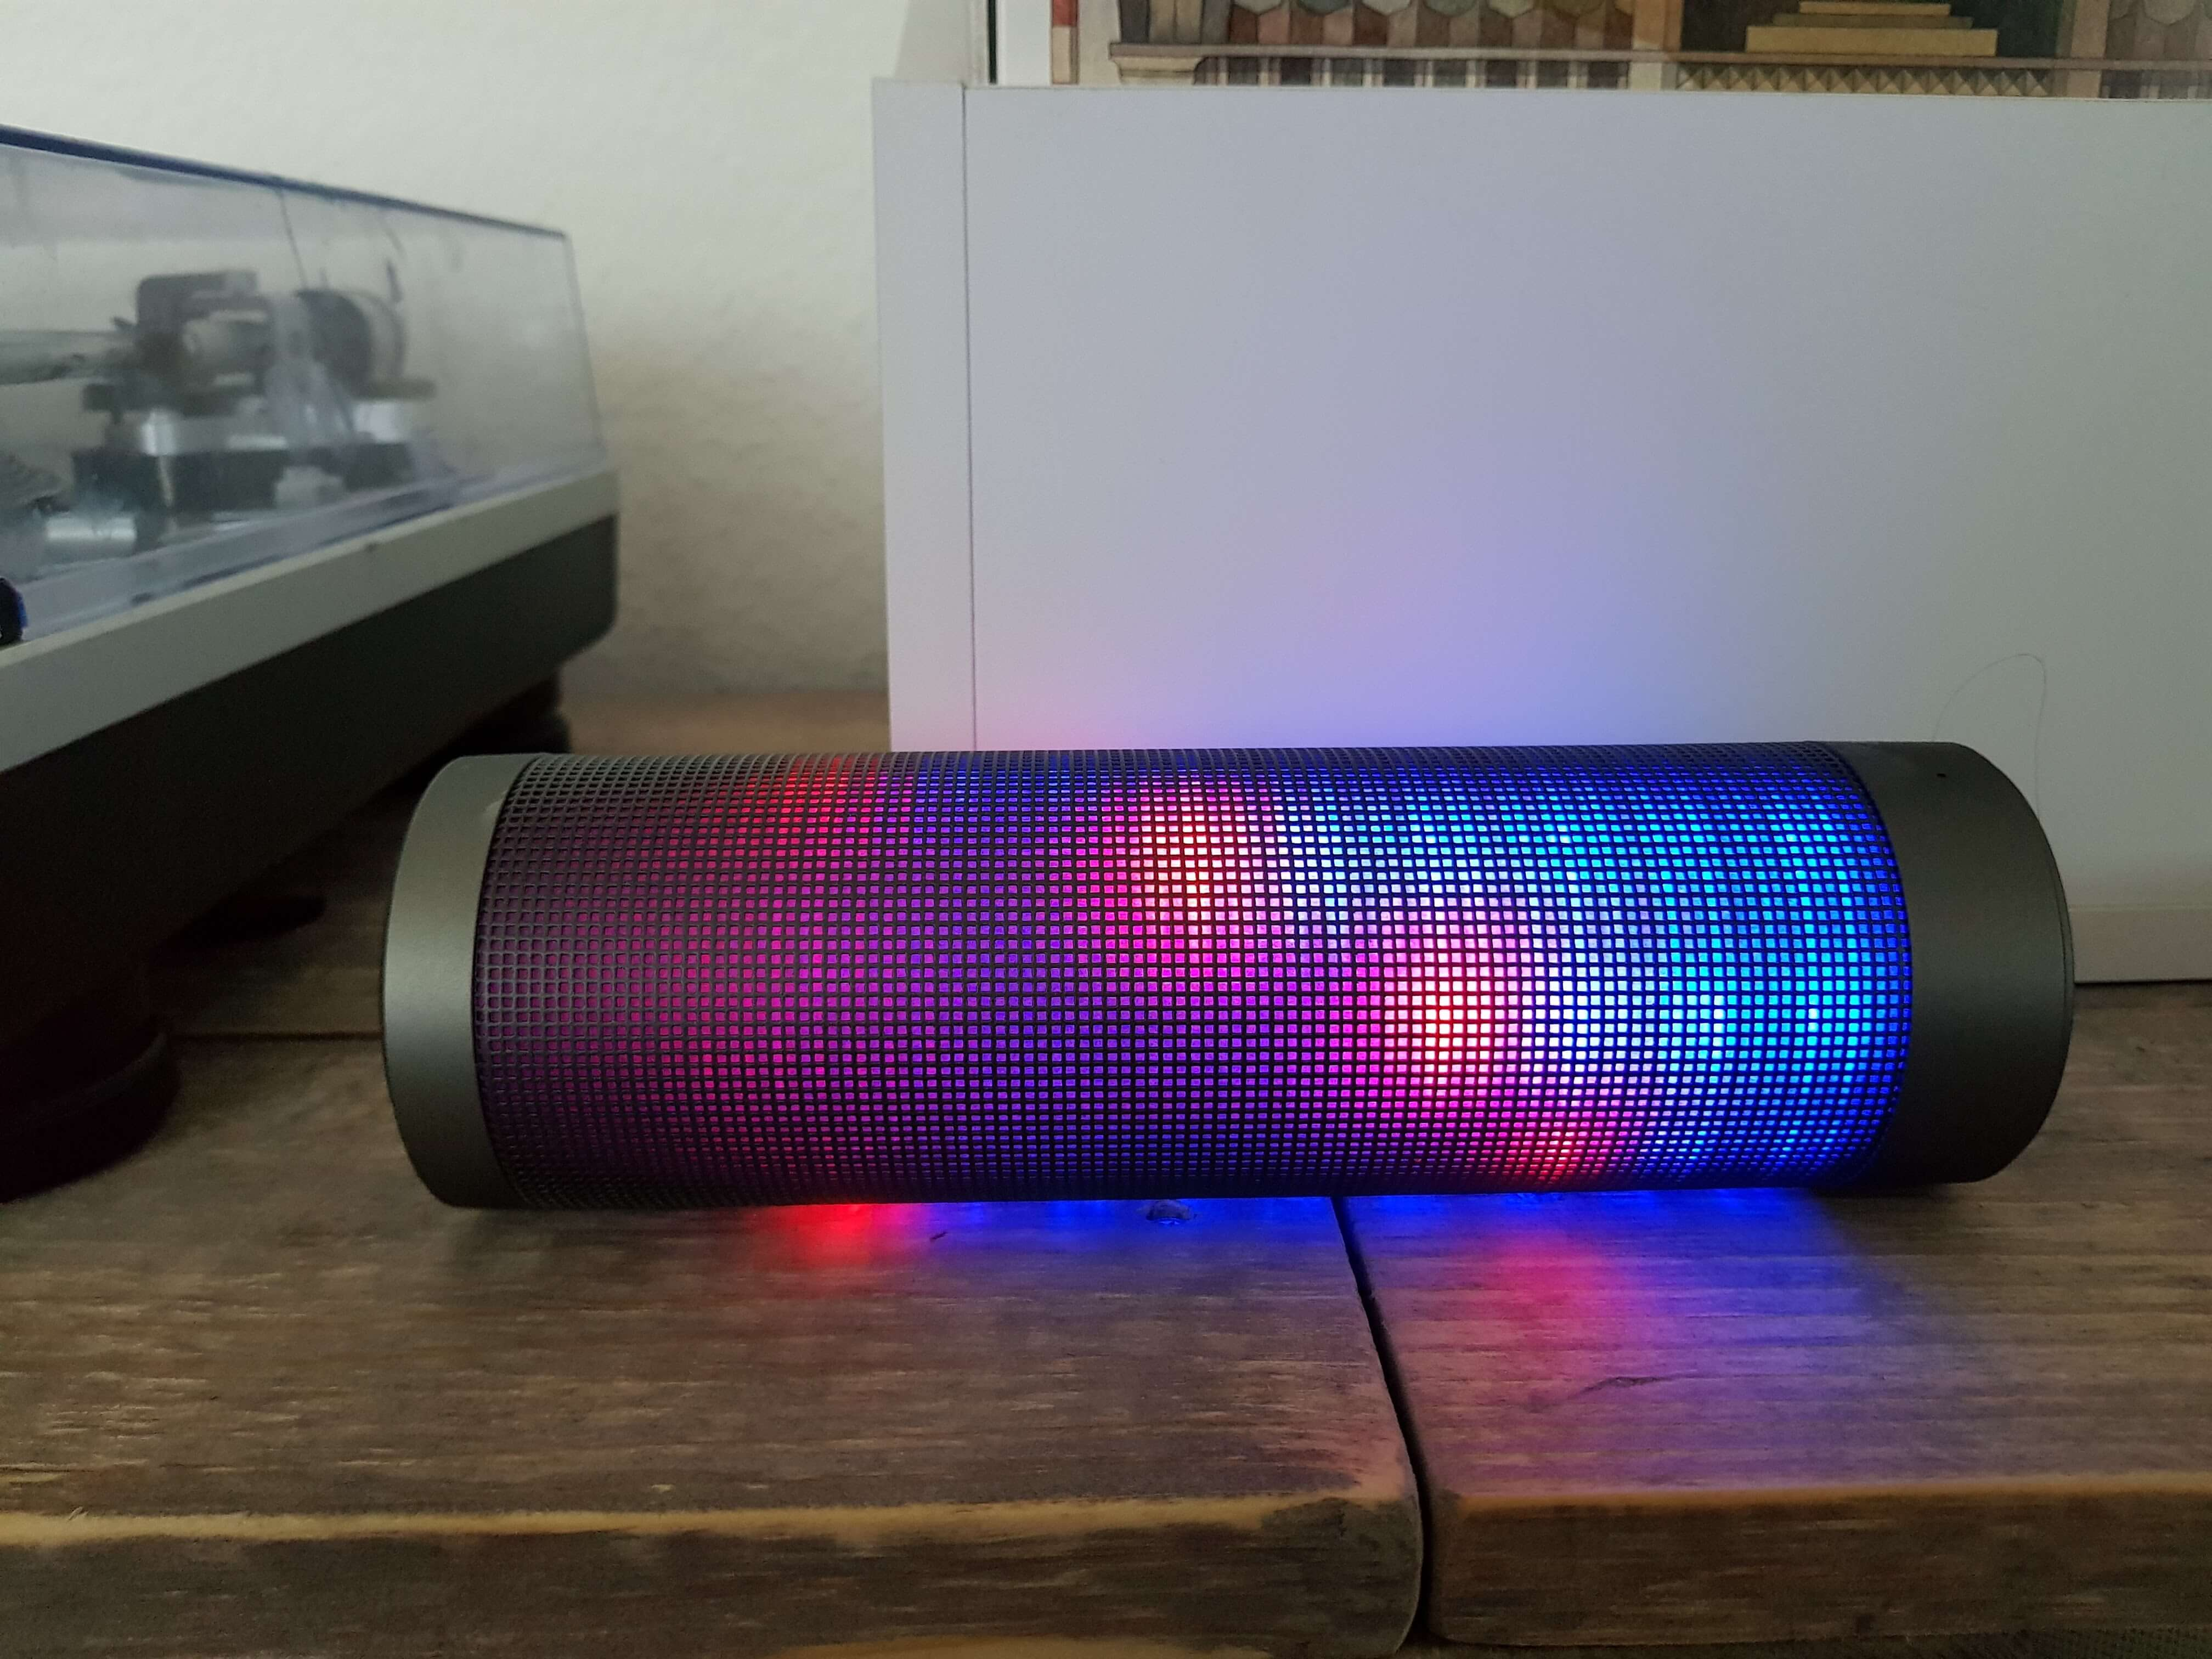 Blinkt viel, klingt gut: Bluetooth Lautsprecher Elegiant HIPHOP im Test 11